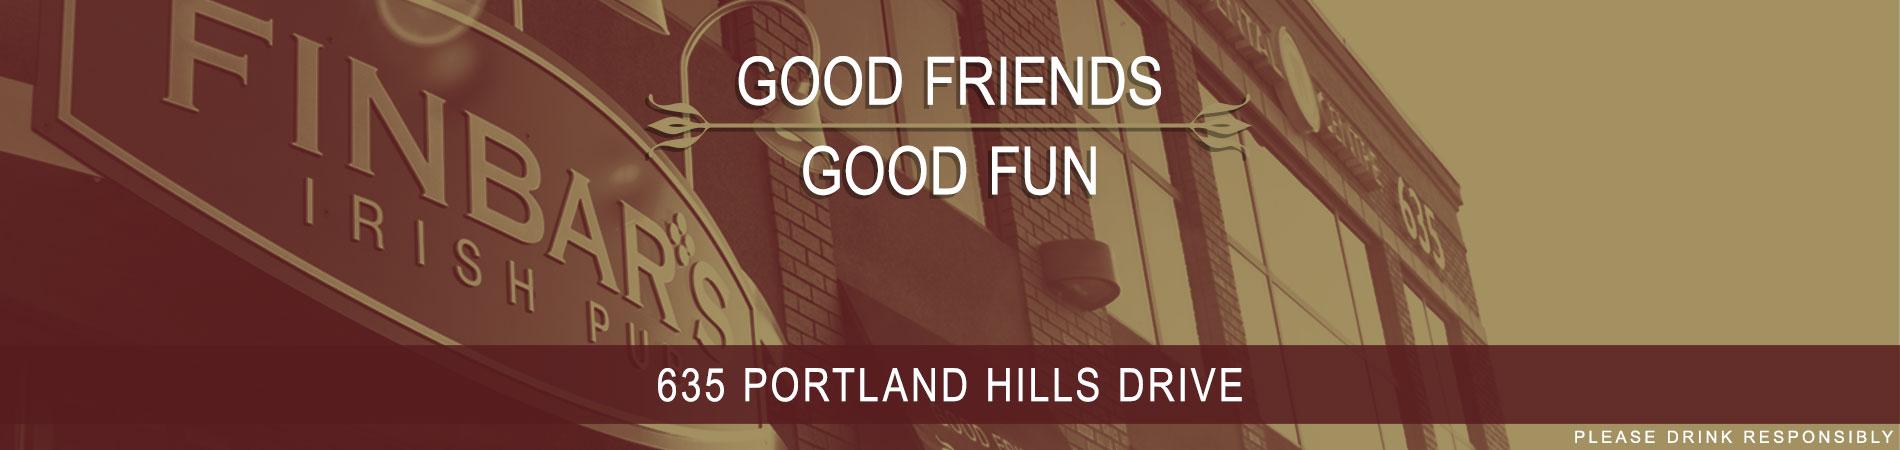 Good friends, good fun.